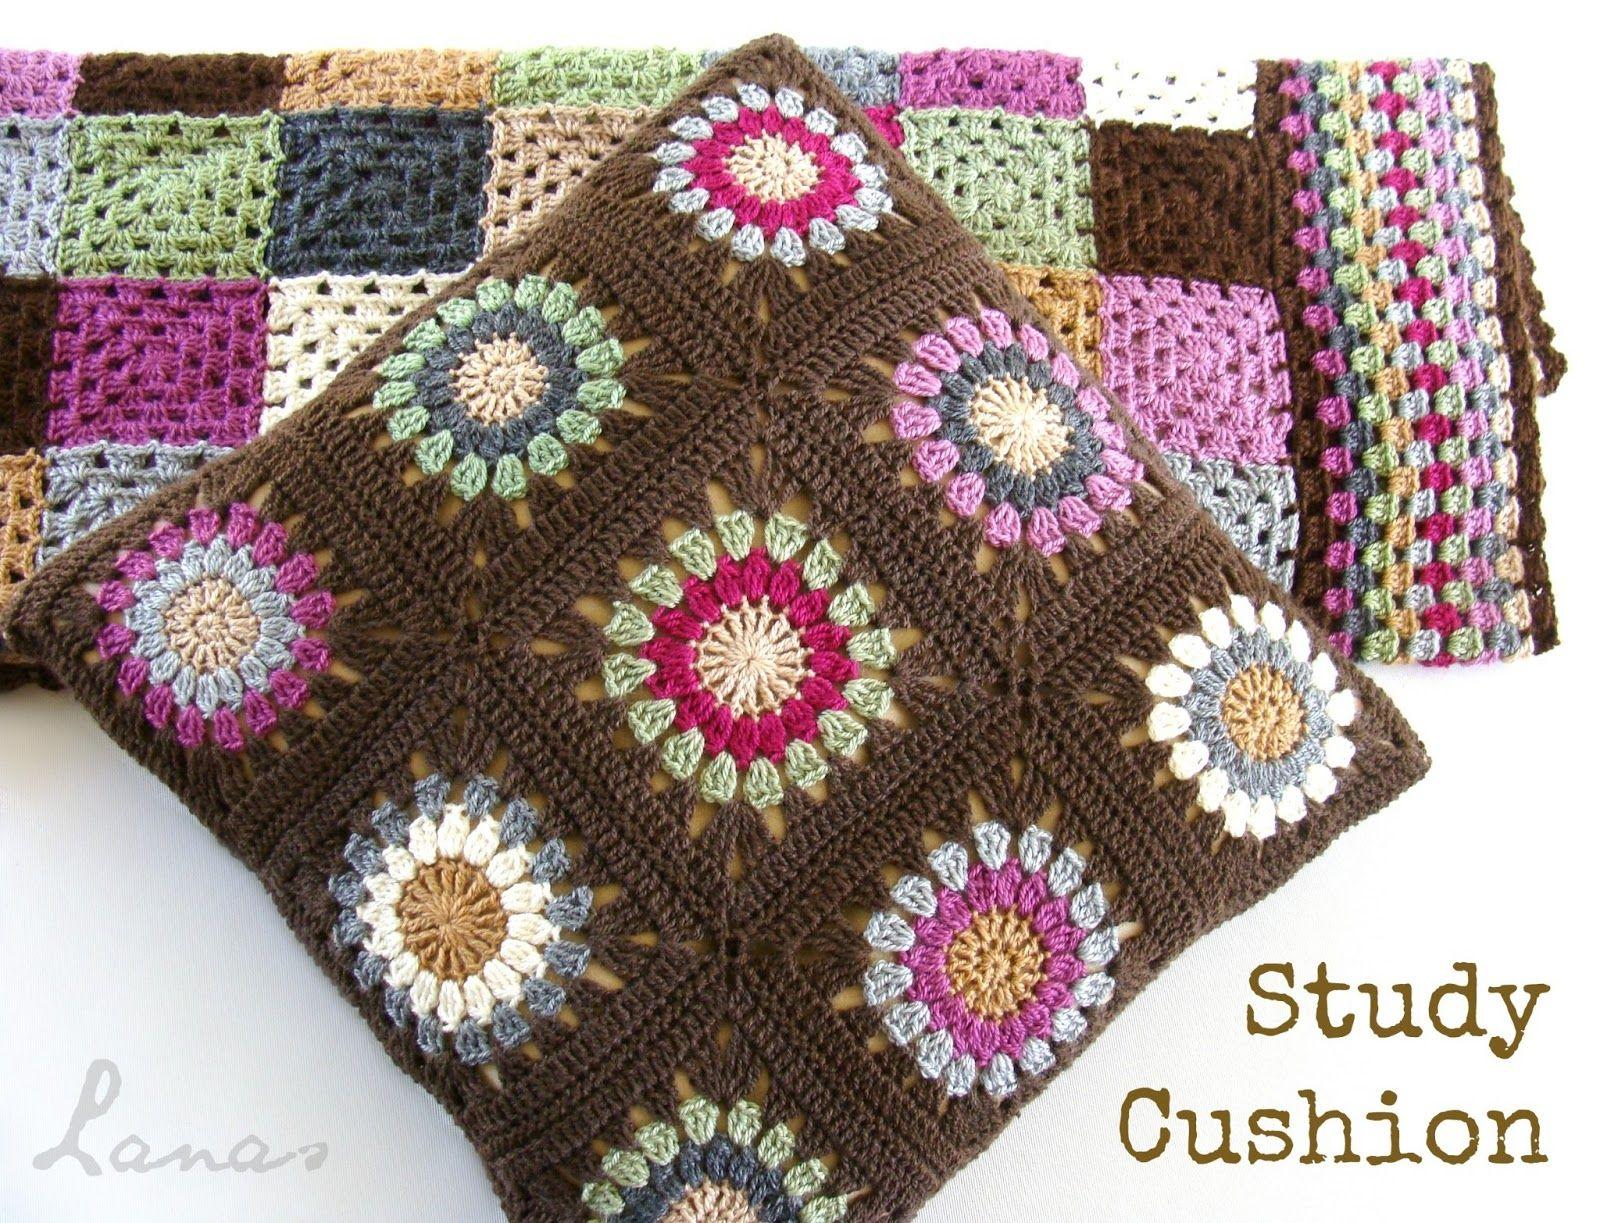 Lanas de Ana: Cushion with Sunburst-like Motif